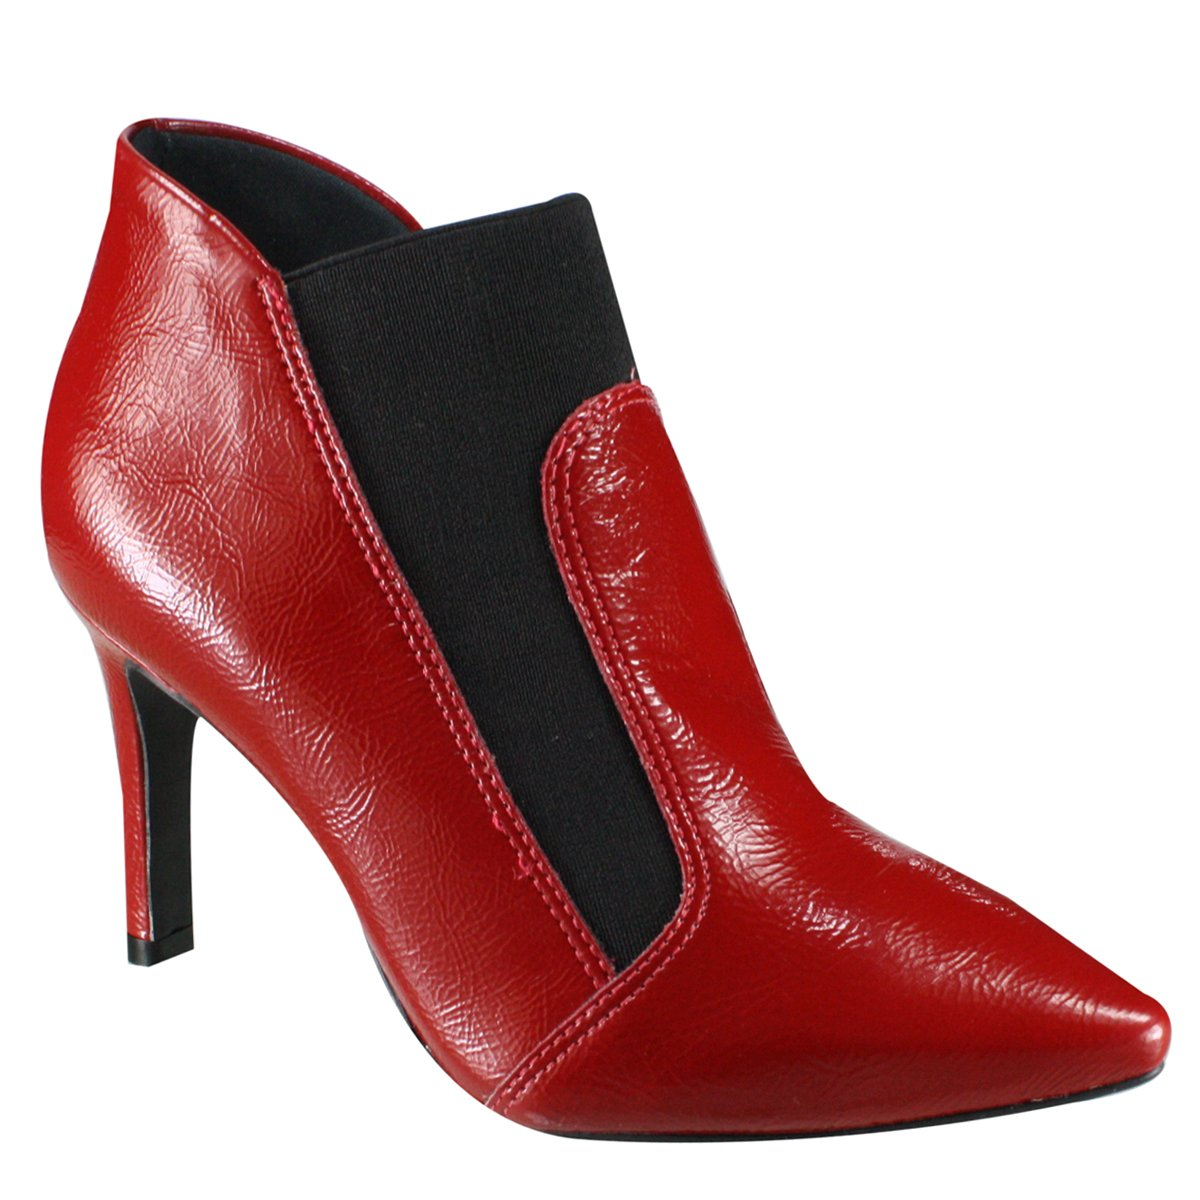 01cf469f38 Bota Feminina Ankle Boot Sandra 59-2803 - Vermelho (Verniz Show ...